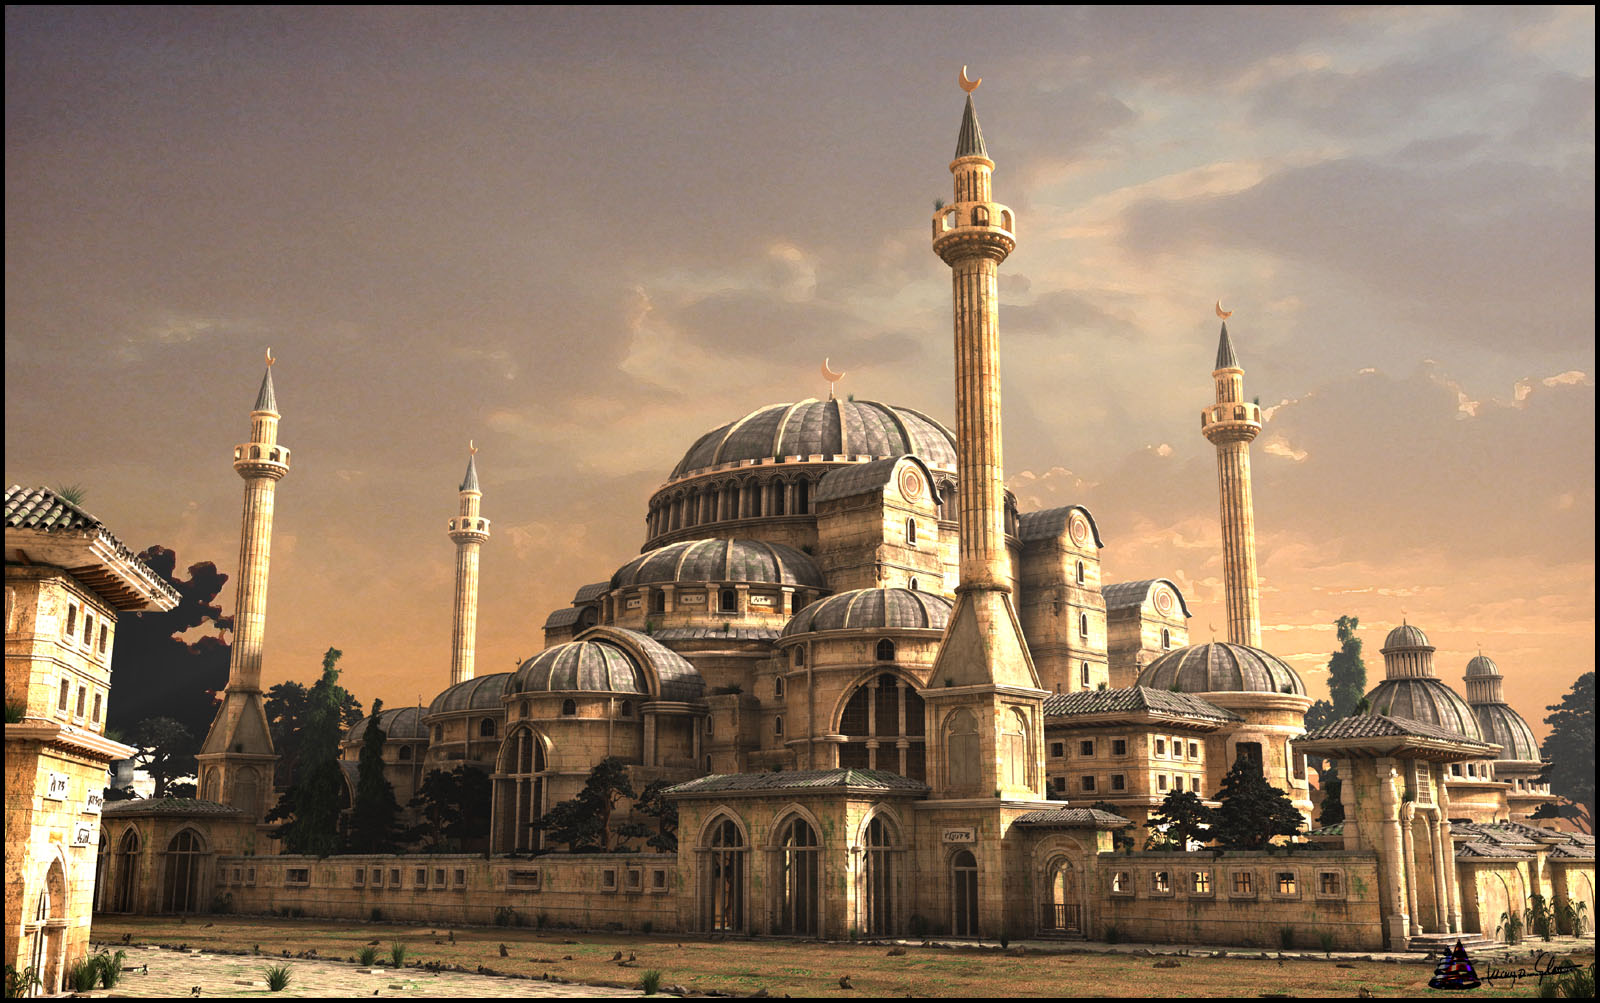 Hagia Sophia in Istanbul | RiTeMaiL